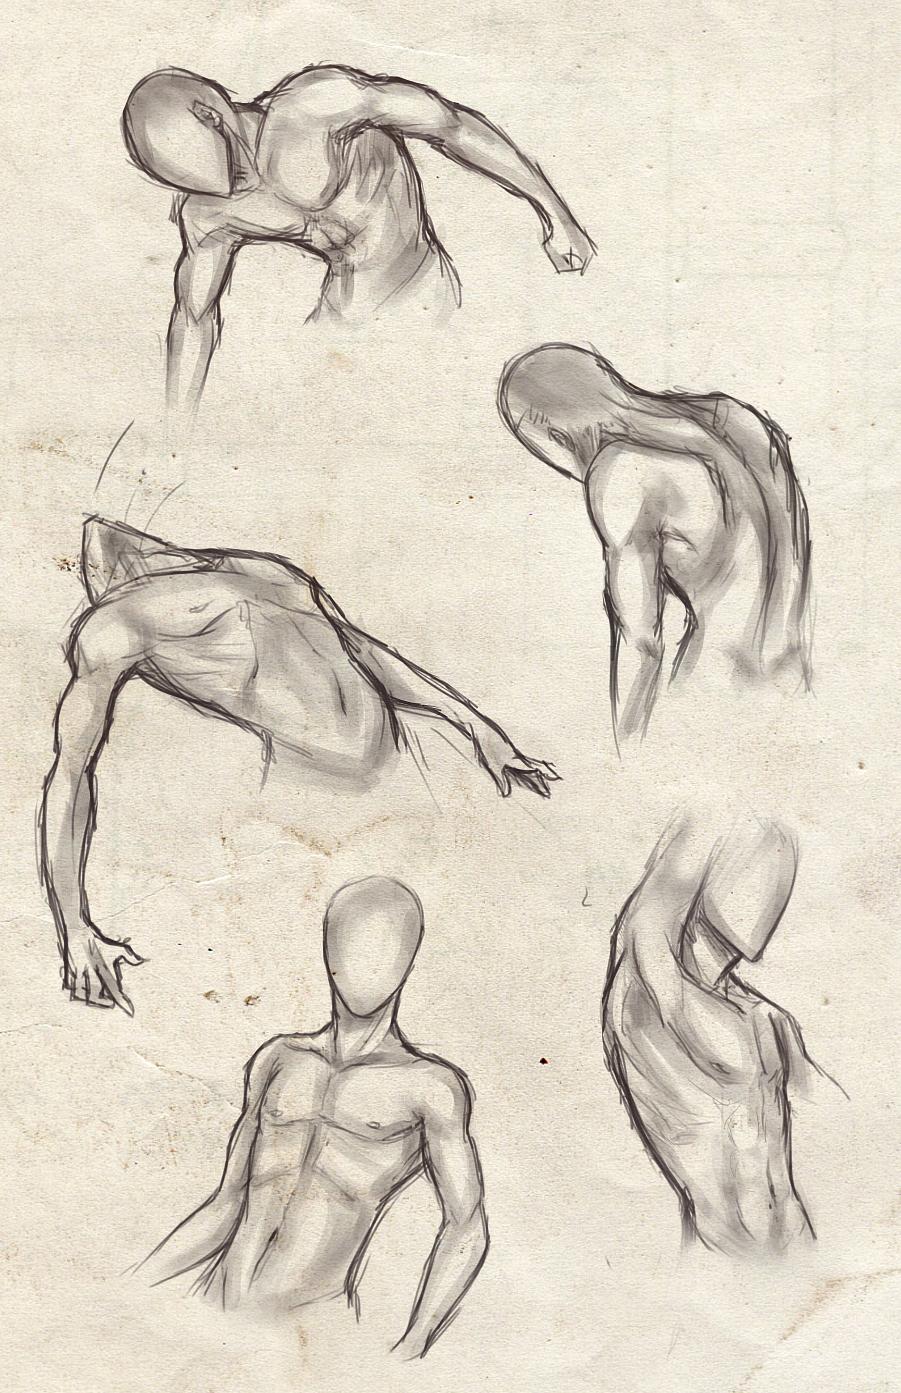 graphic transparent stock Drawing torso. Pin by sarafina lamantia.